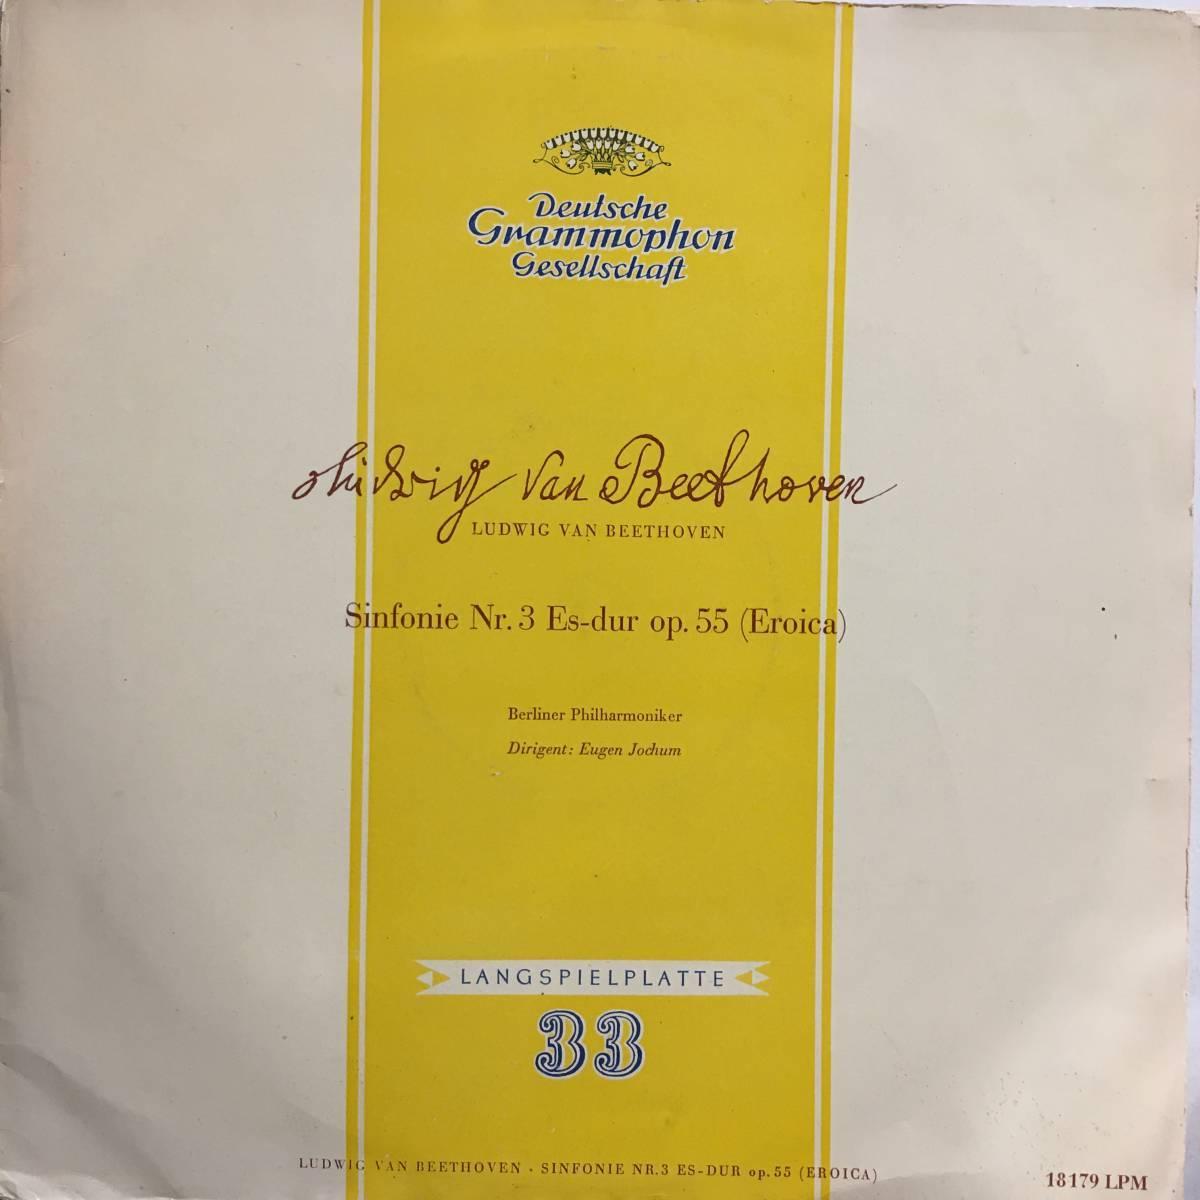 LP独DGG ヨッフム BPO ベートーヴェン 交響曲3番_画像1